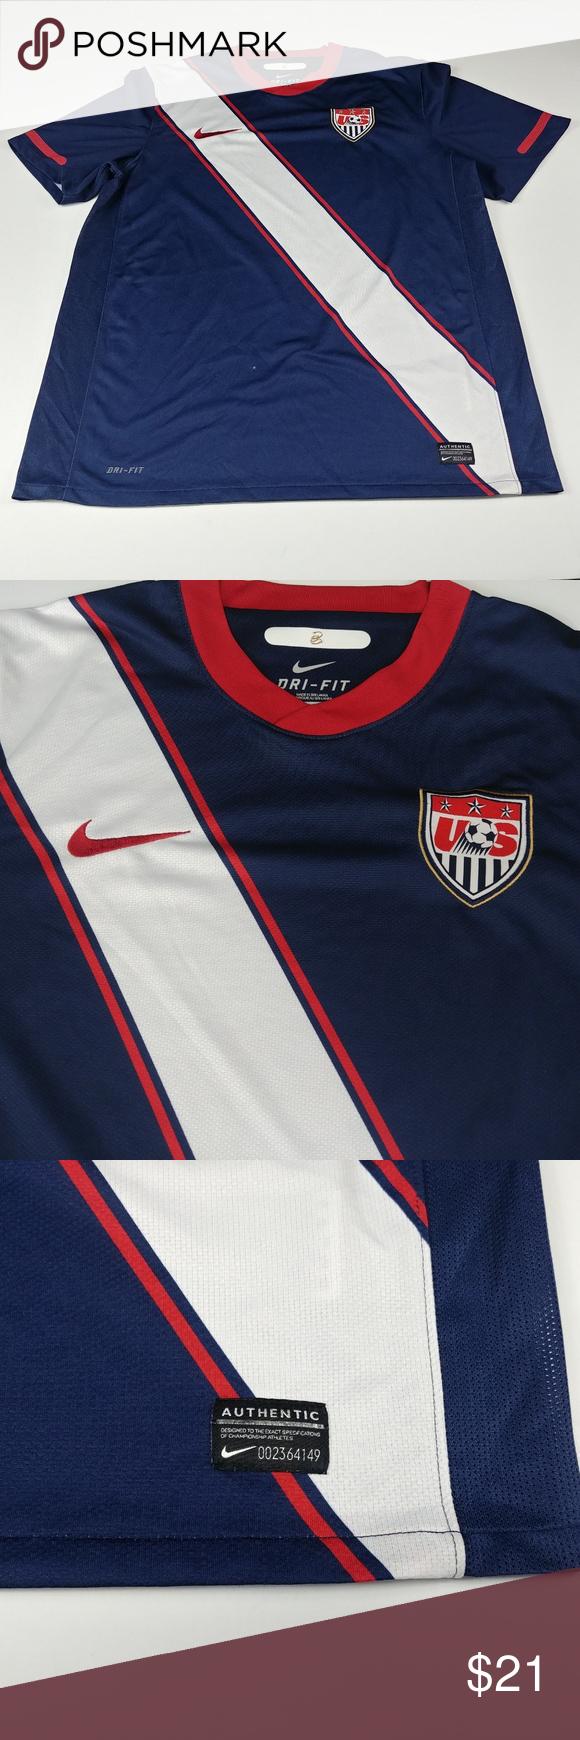 f586f97f9e1 Nike Mens USMNT USA Soccer Jersey Large L Blue Nike Mens USMNT USA Soccer  Jersey Large